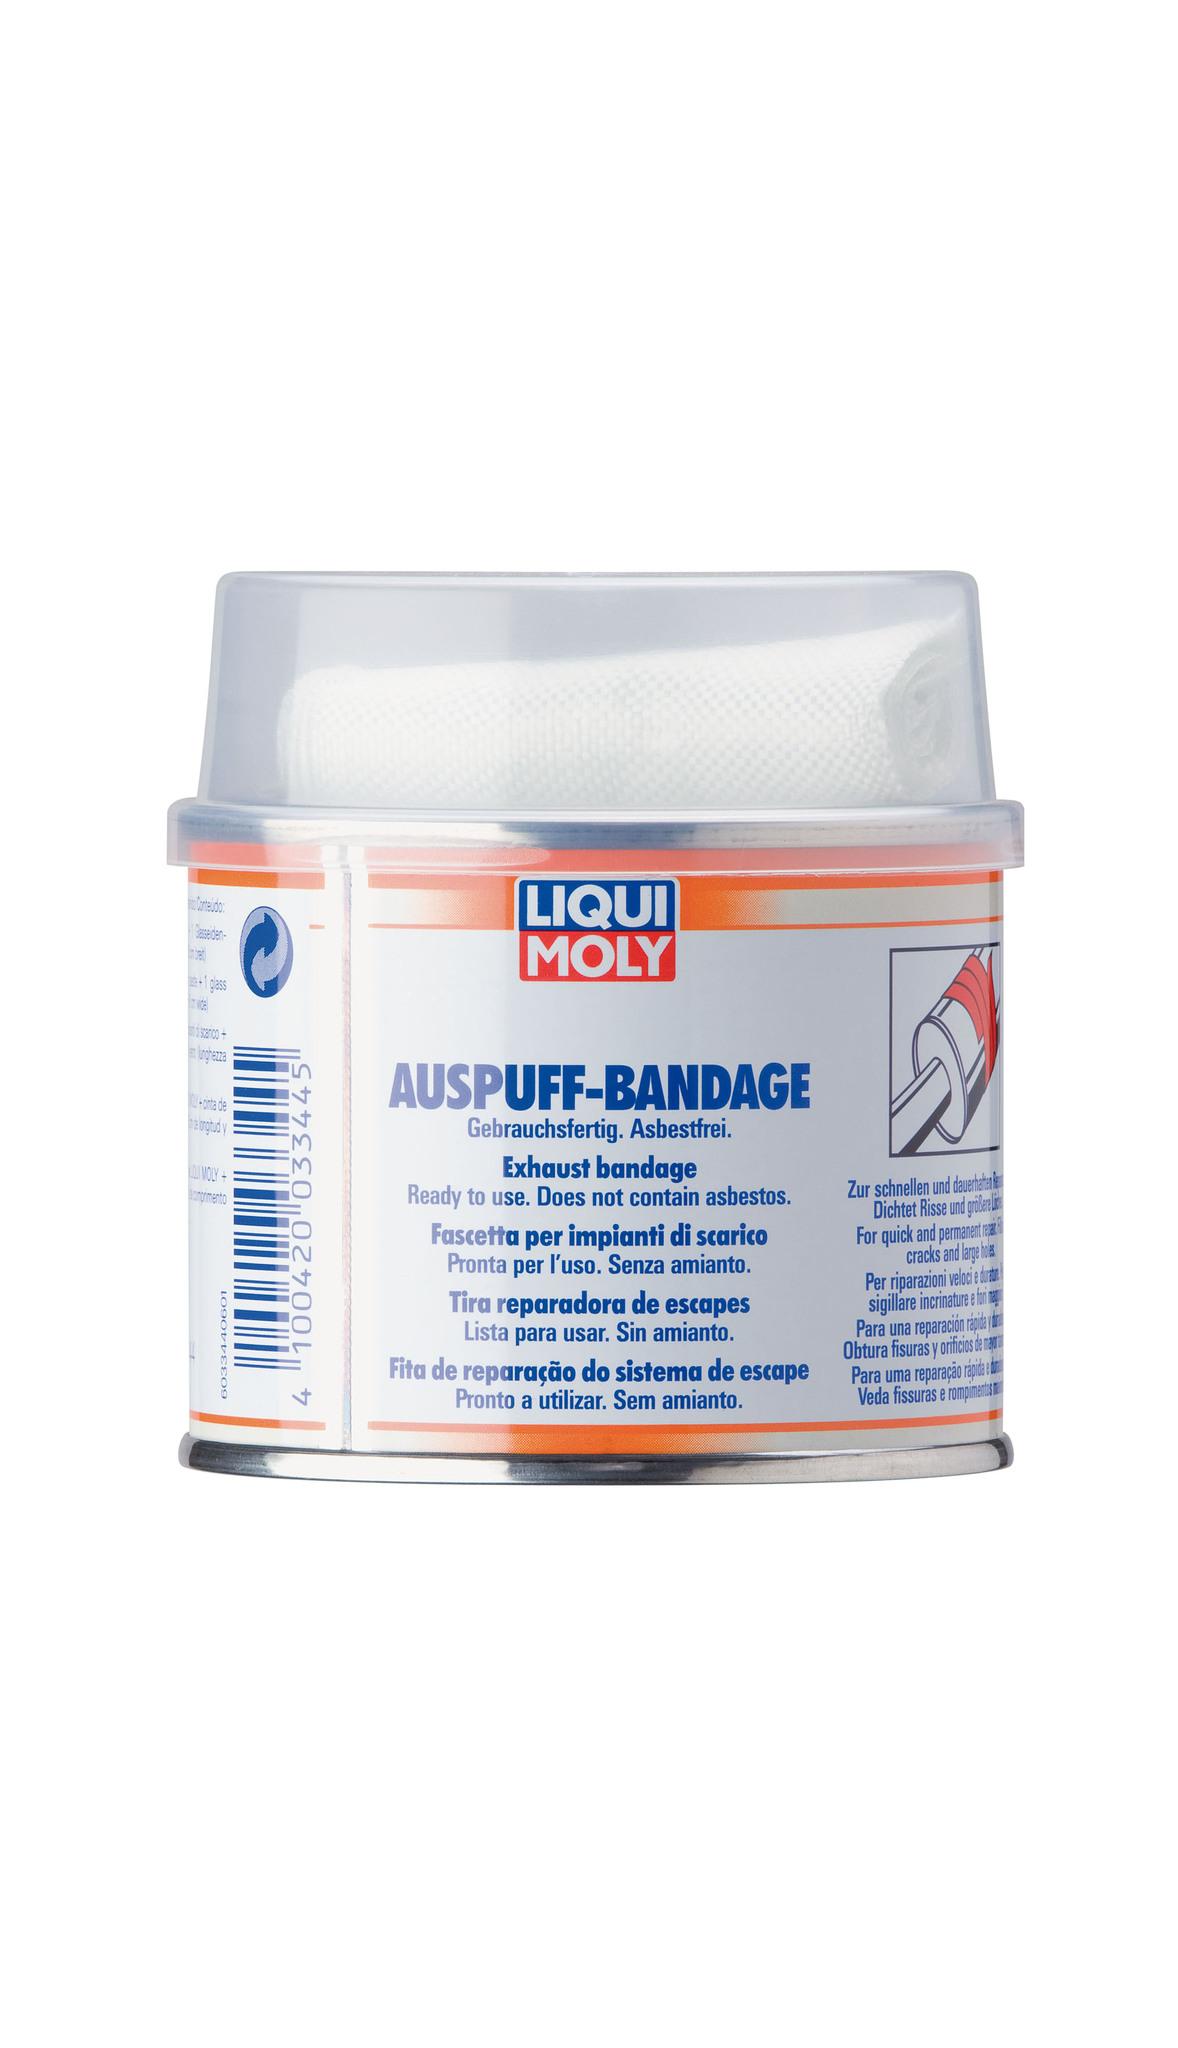 Liqui Moly Auspuff Bandage gebrauchsfertig Бандаж для ремонта системы выхлопа